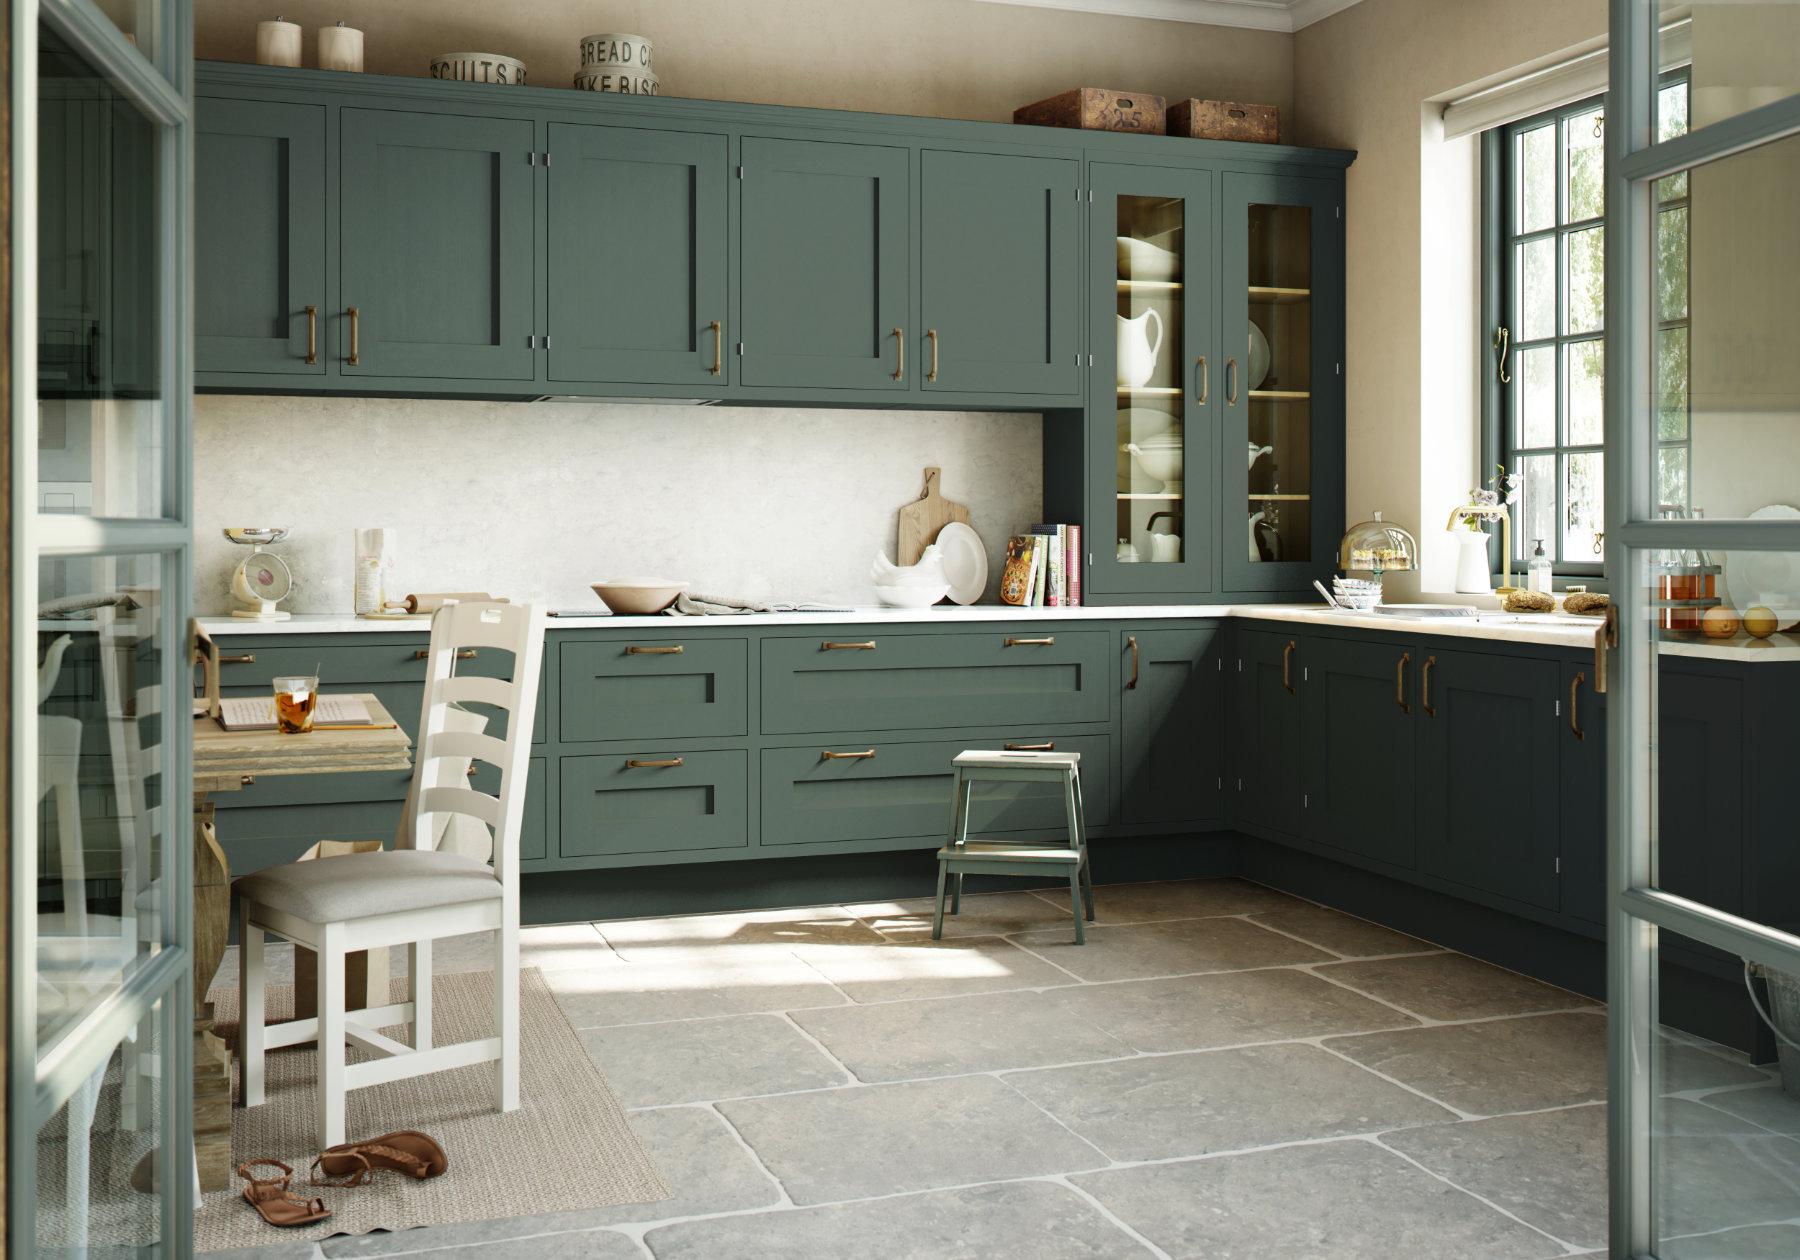 Manor Interiors Green Shaker Kitchen | MHK Kitchen Experts